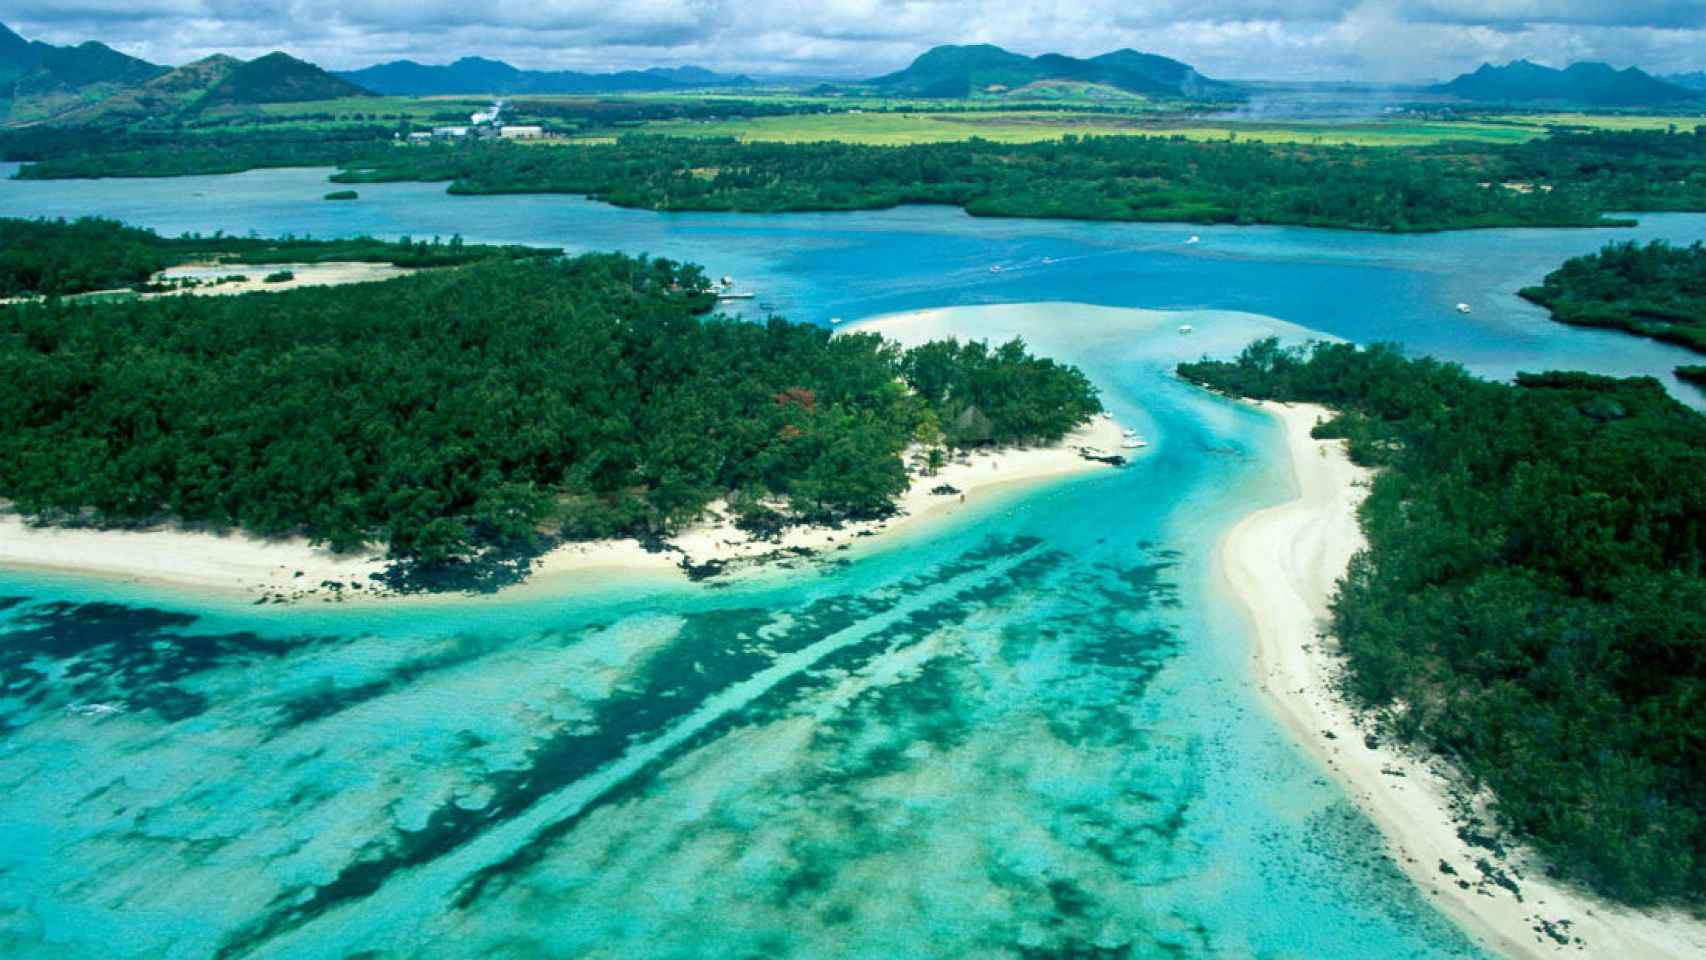 Otra imagen de la isla.